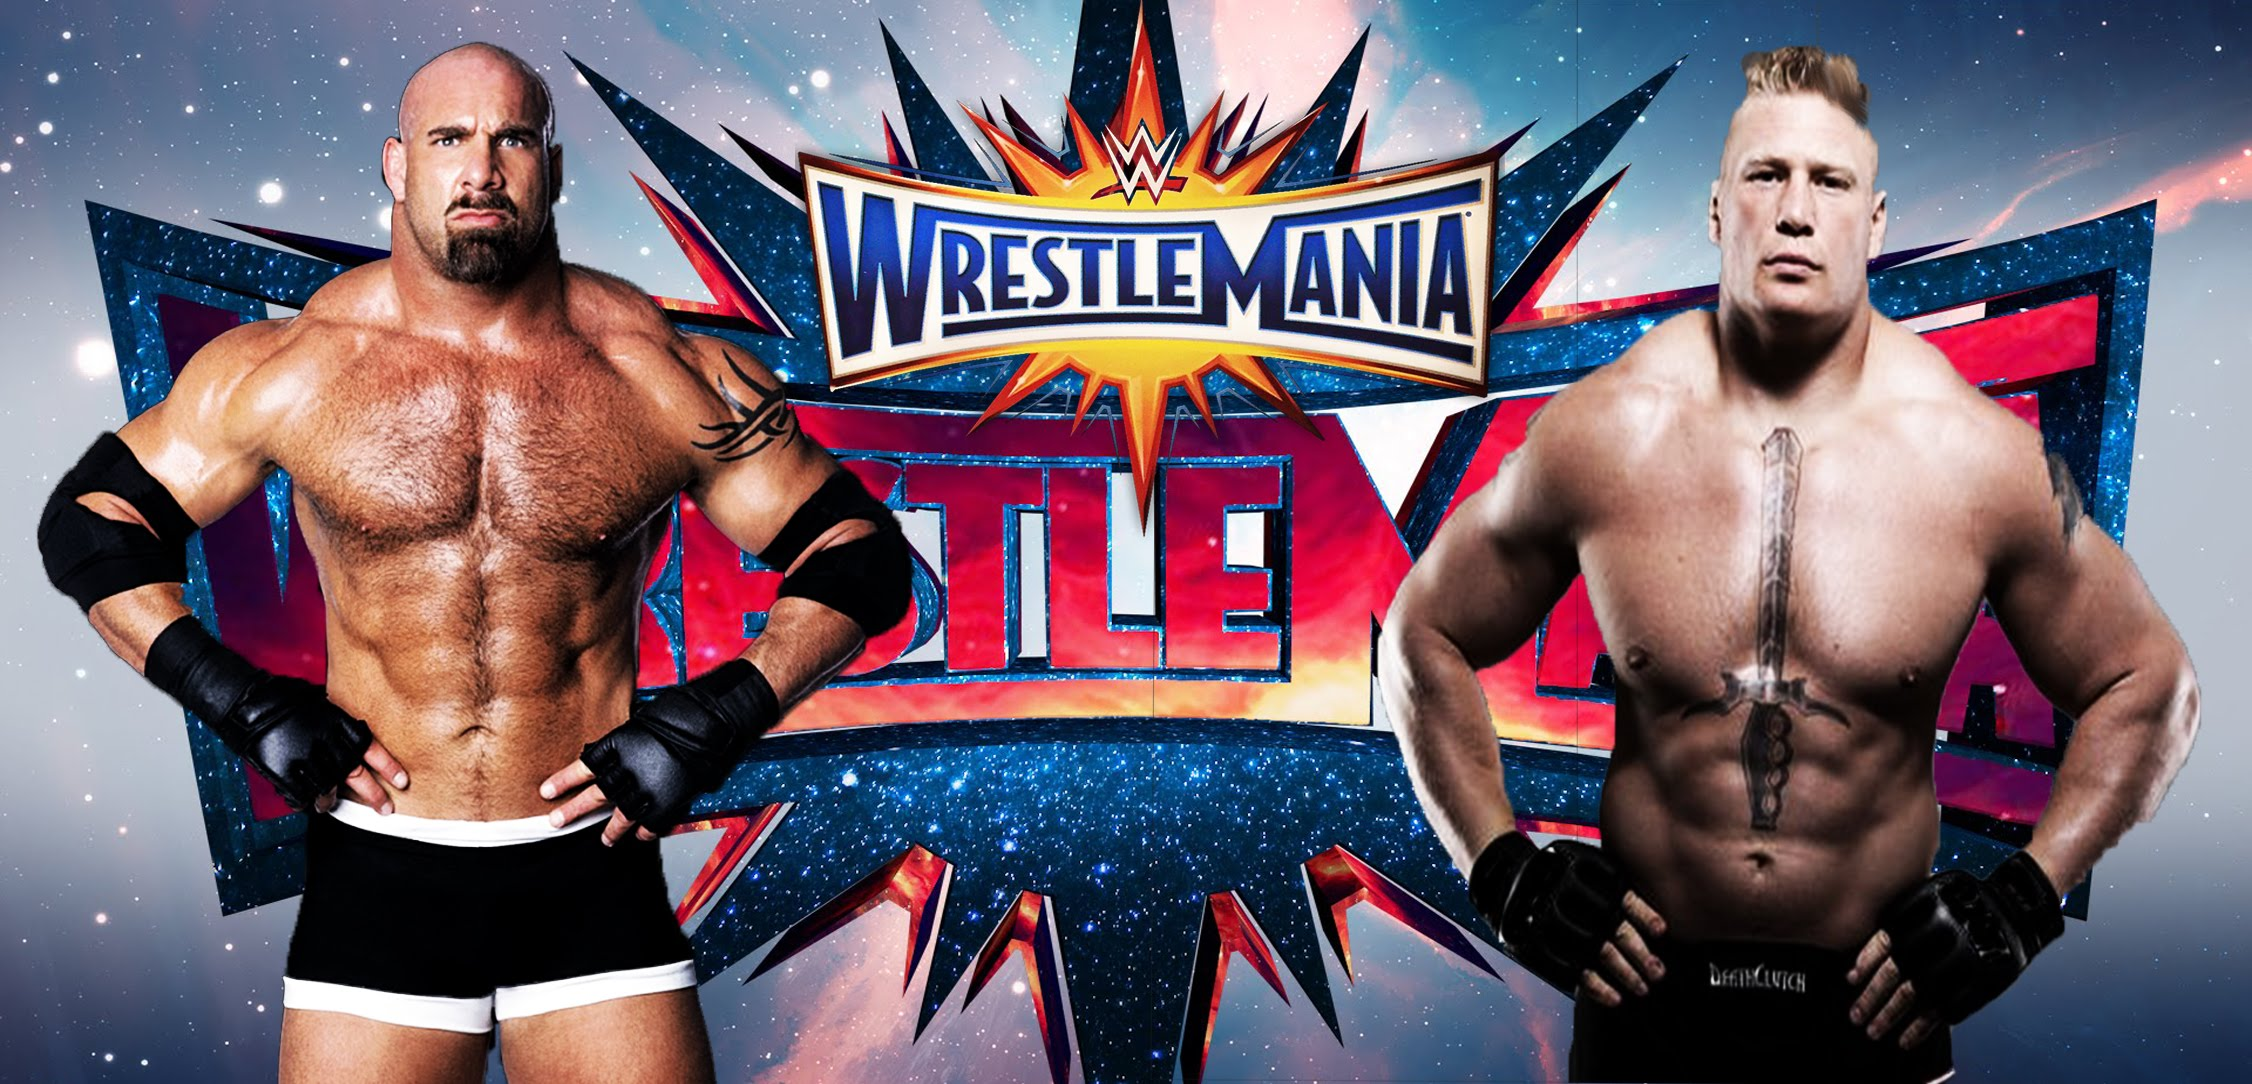 How To Watch WWE On Kodi Stream WrestleMania On Kodi